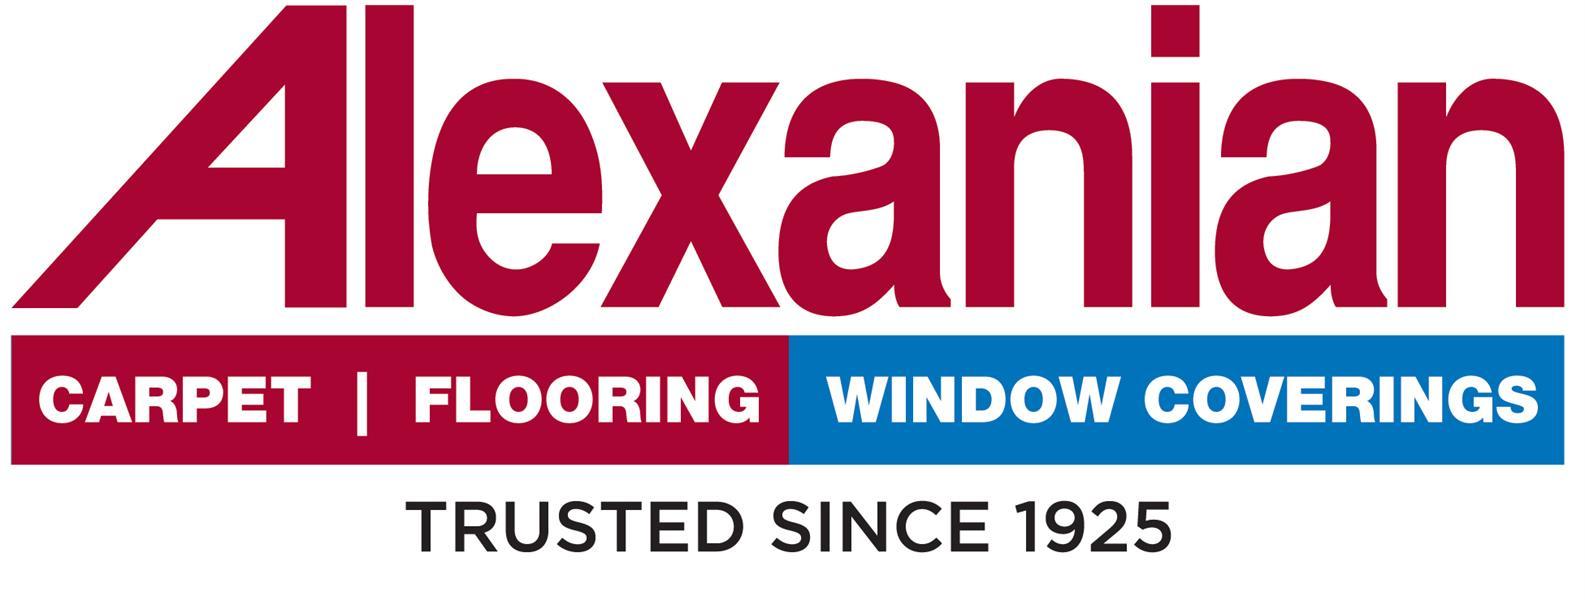 Alexanian Carpet - Flooring - Window Coverings